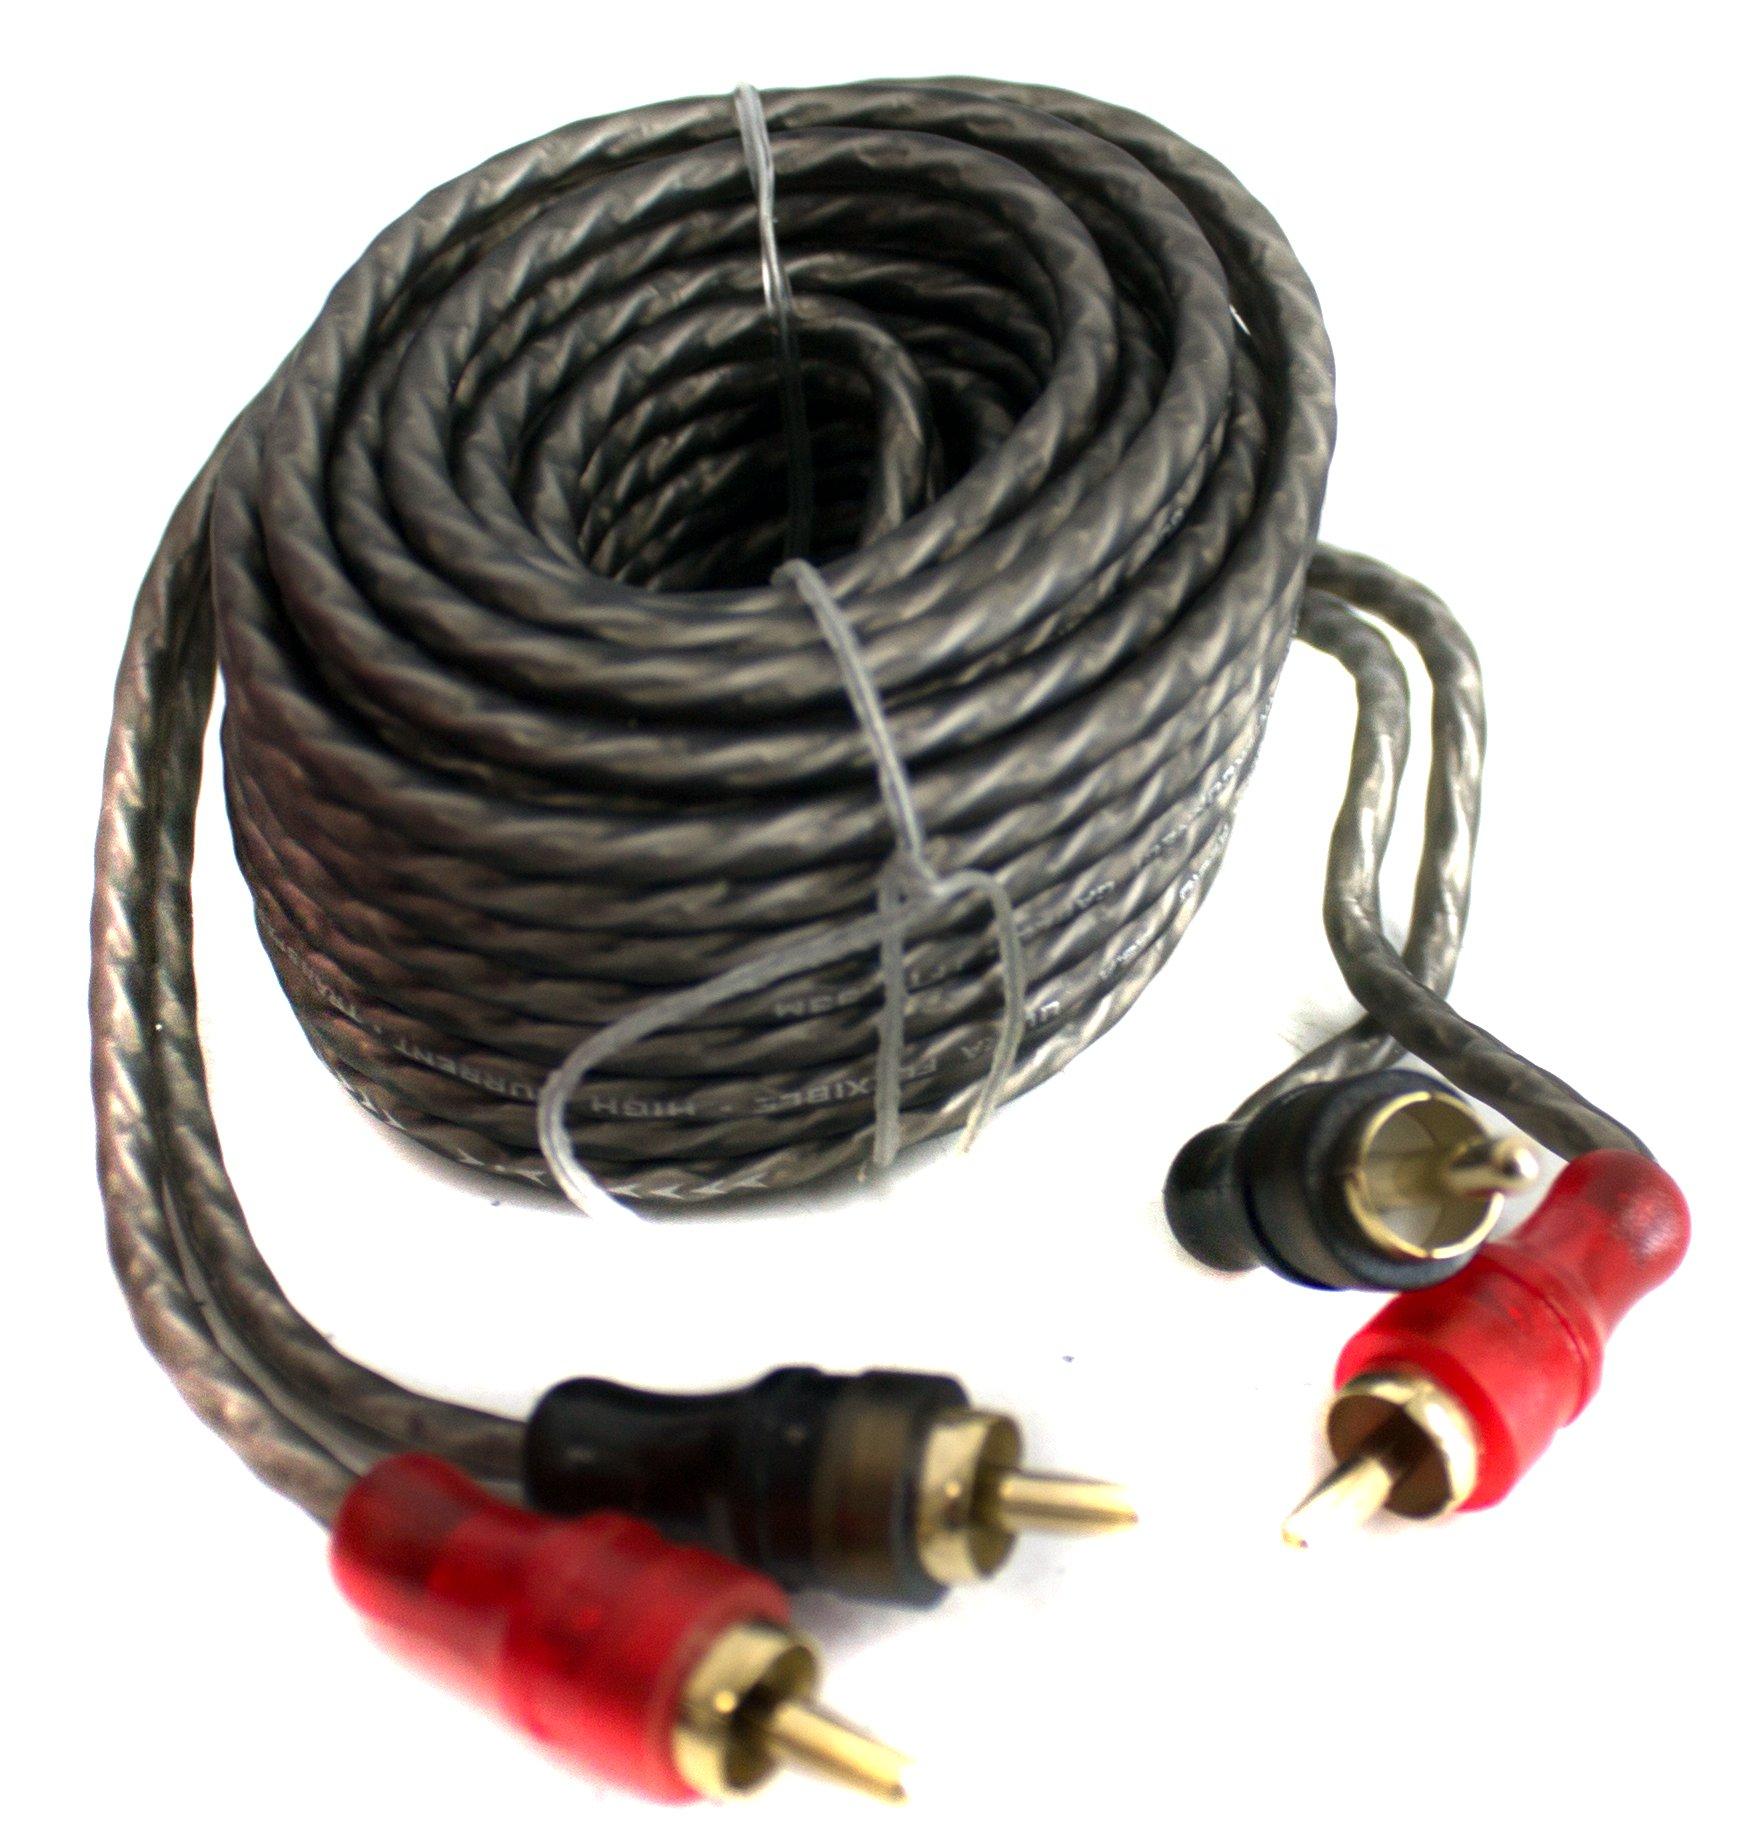 hight resolution of bullz audio 4 gauge 3000w professional car amplifier wiring amp kit red bpe4r walmart canada